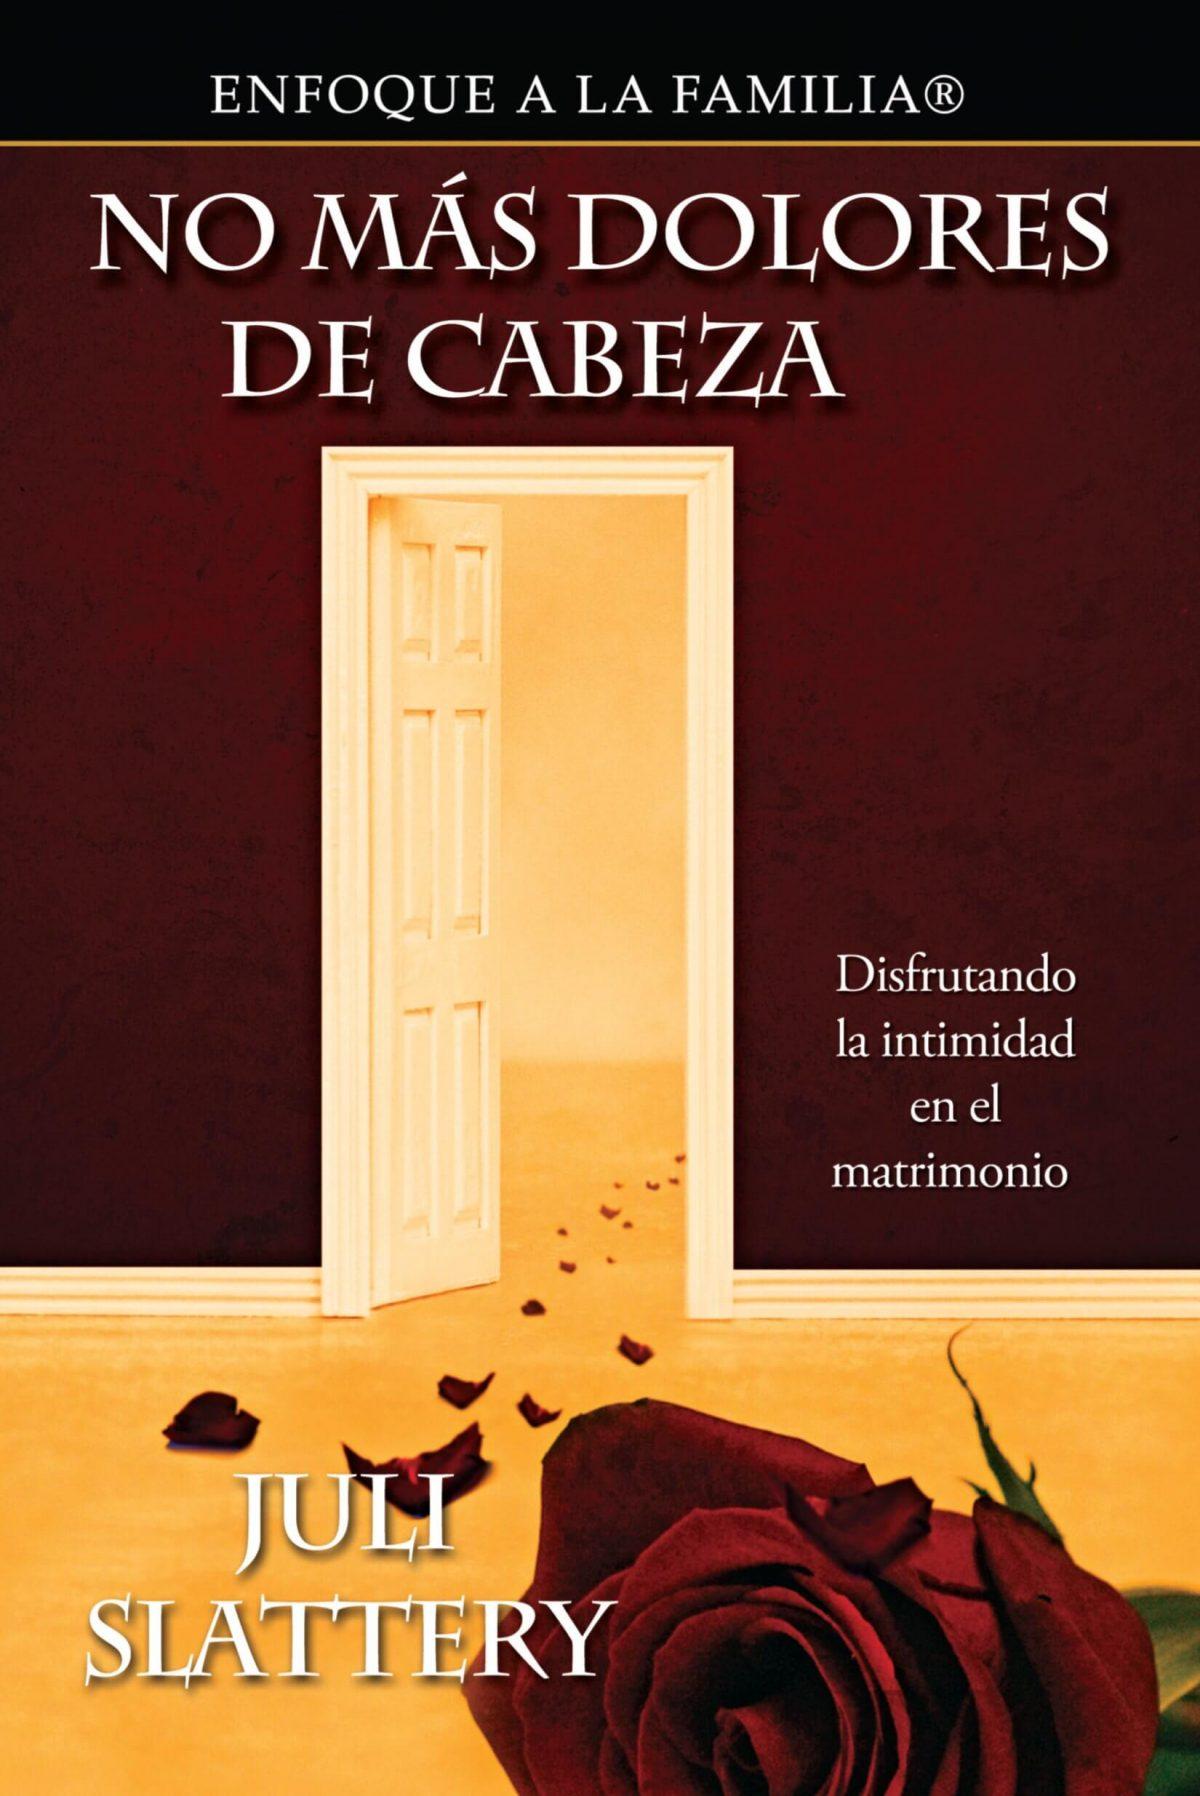 NO MAS DOLORES DE CABEZA